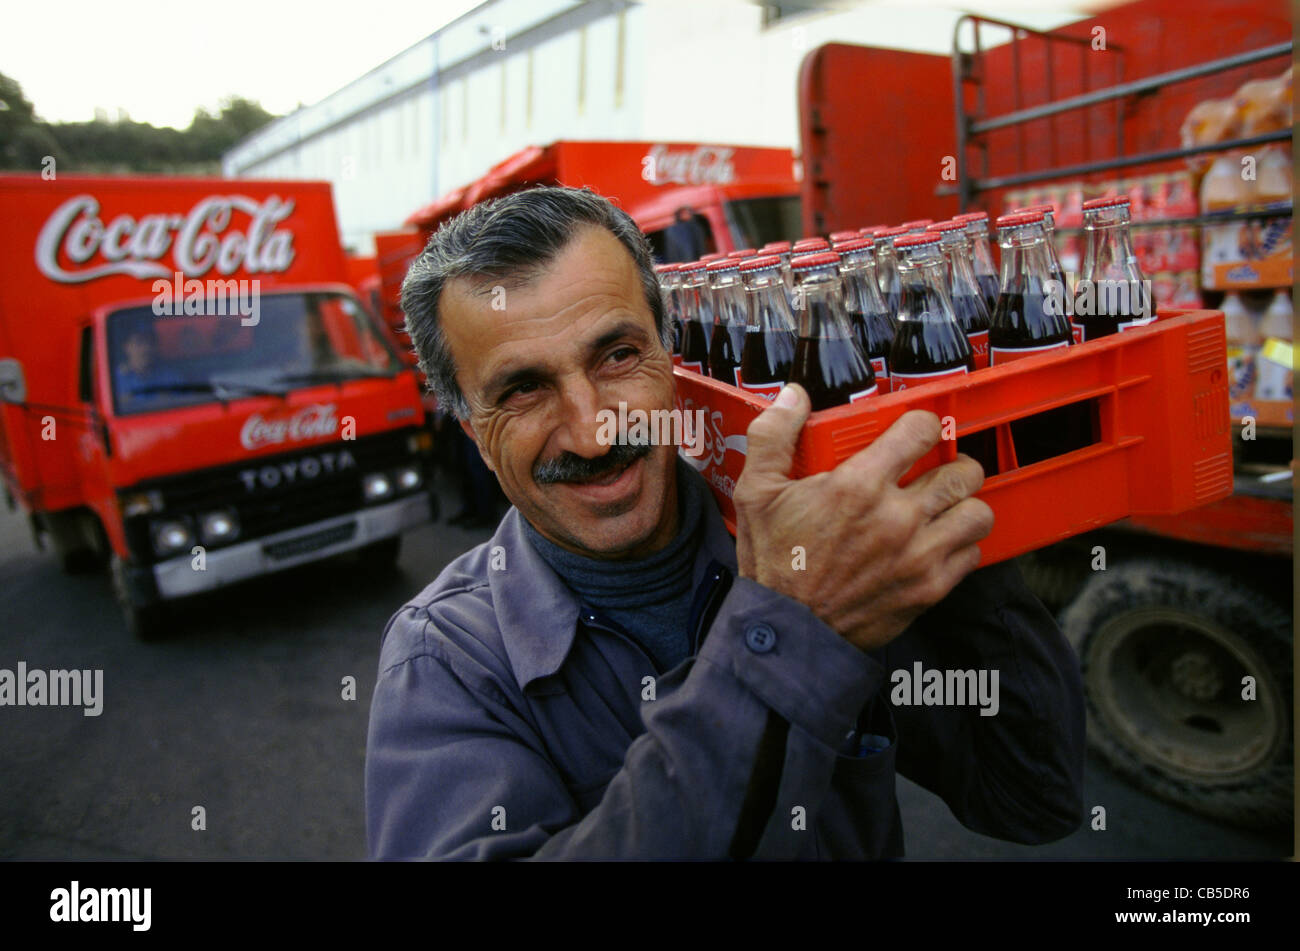 coca cola driver